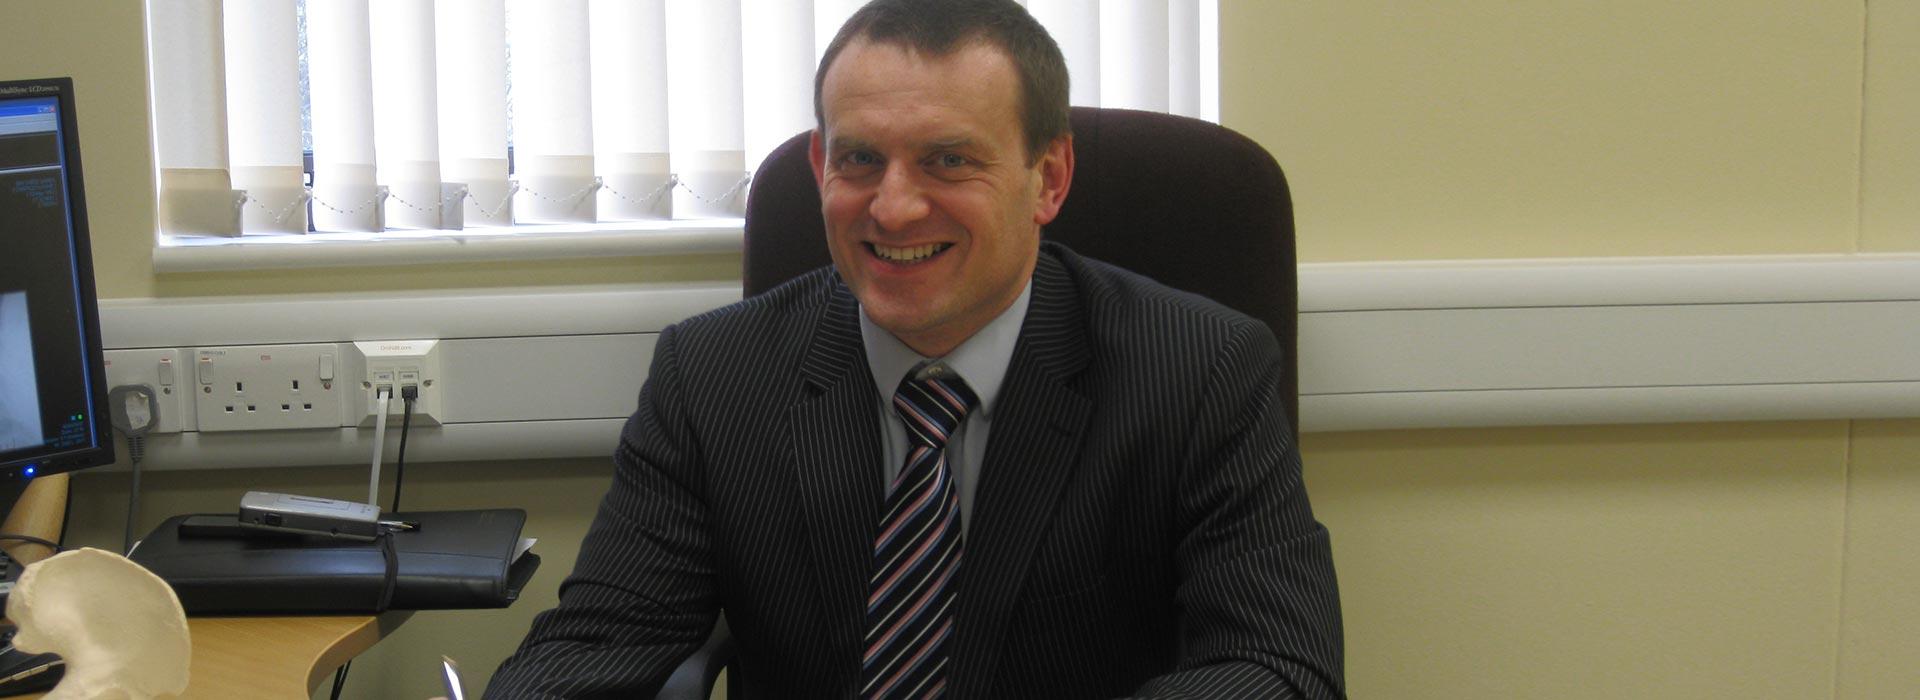 Gary Mundy, Lower Limb Specialist